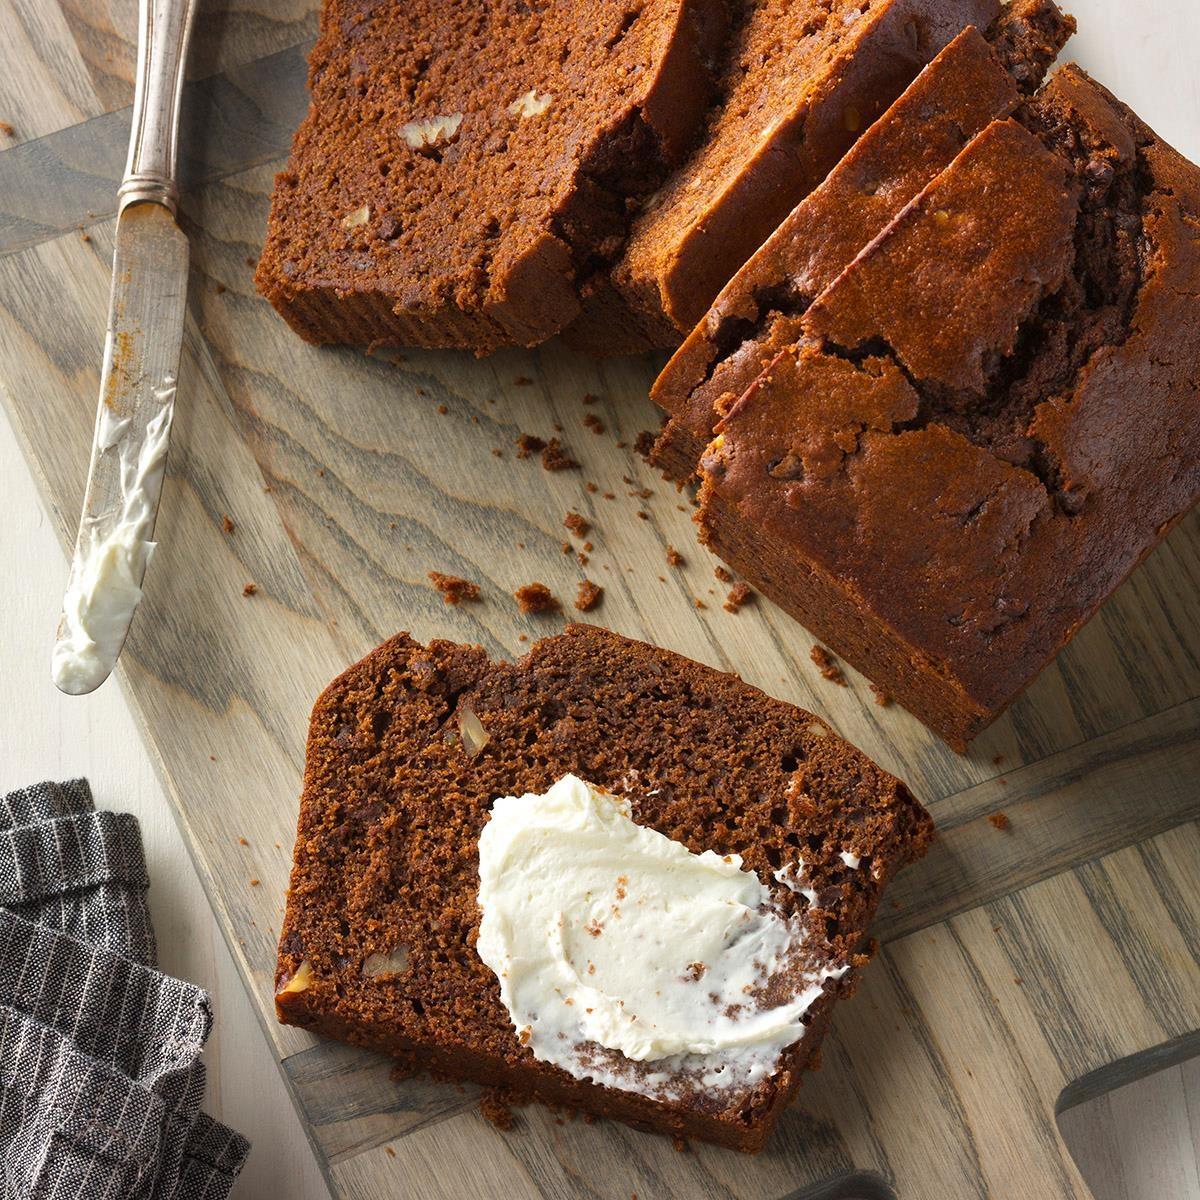 Chocolate Quick Bread Recipe | Taste of Home